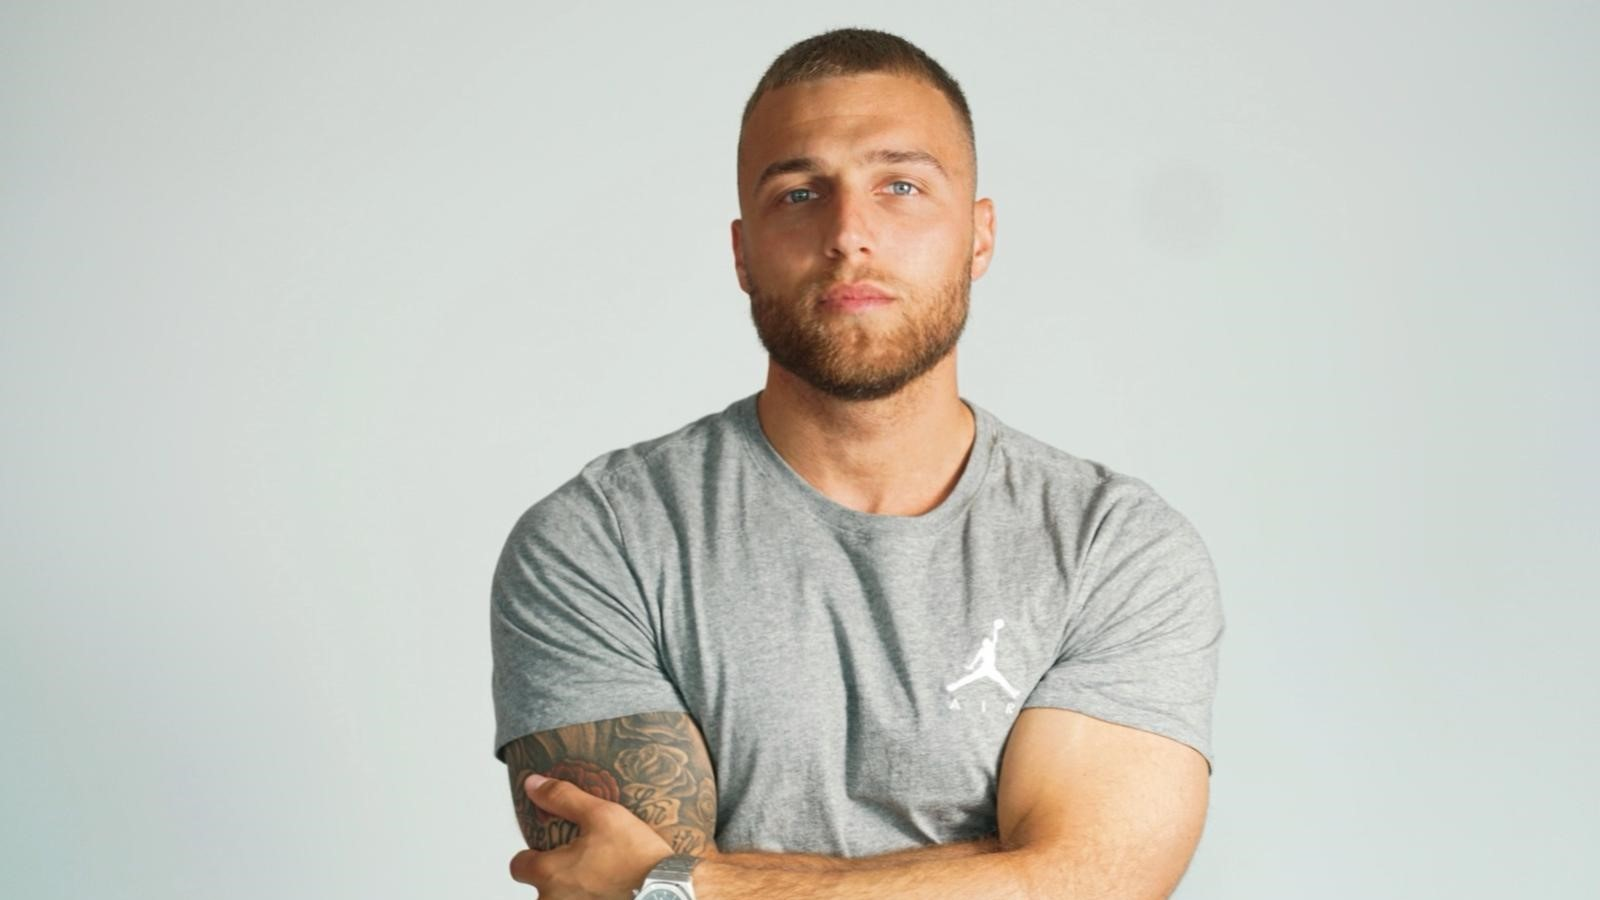 Dschungelshow-Kandidat Filip Pavlovic